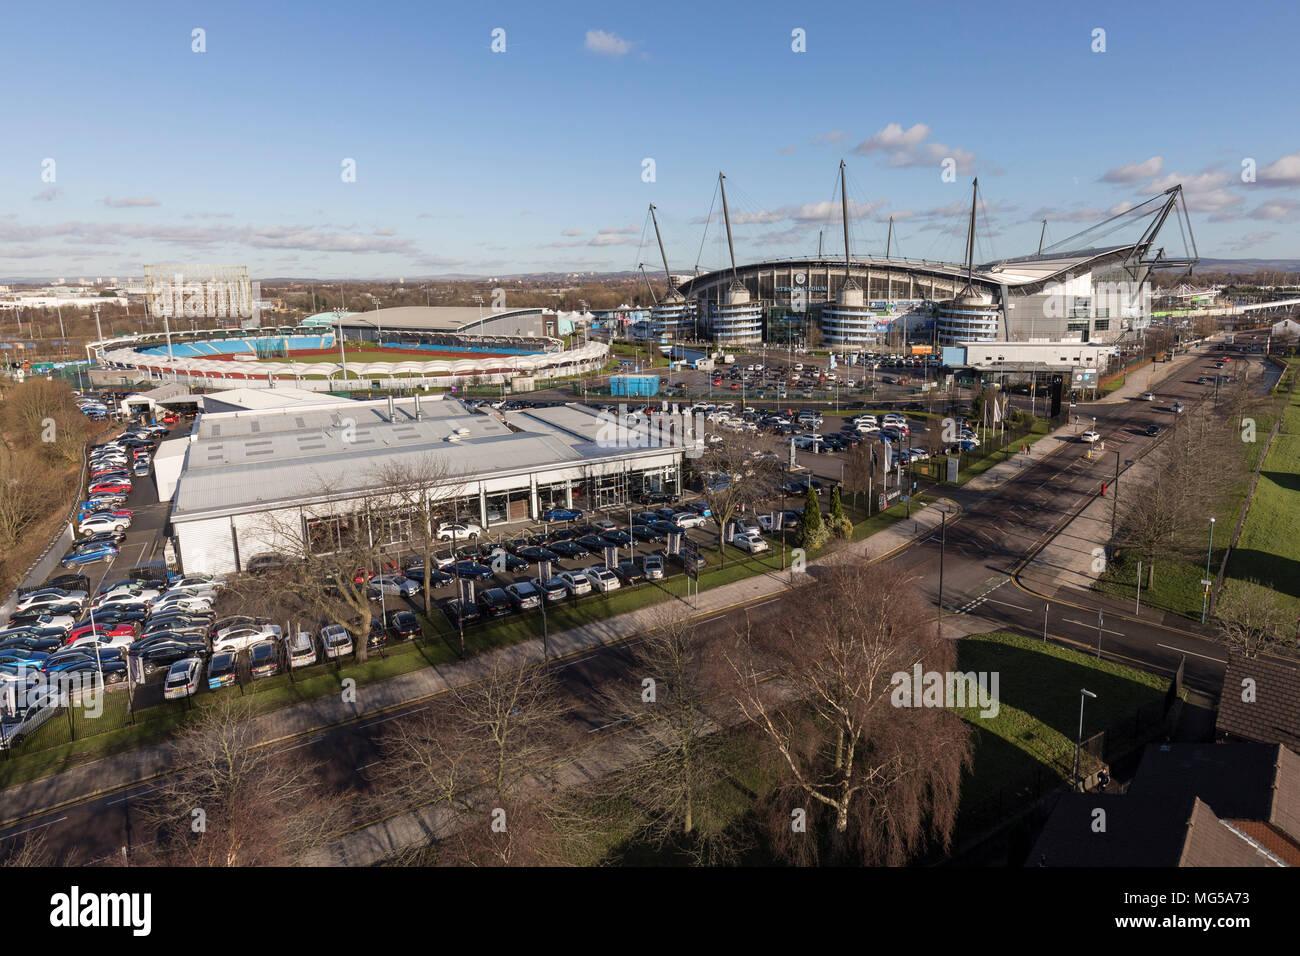 Manchester City Etihad Stadium - Stock Image